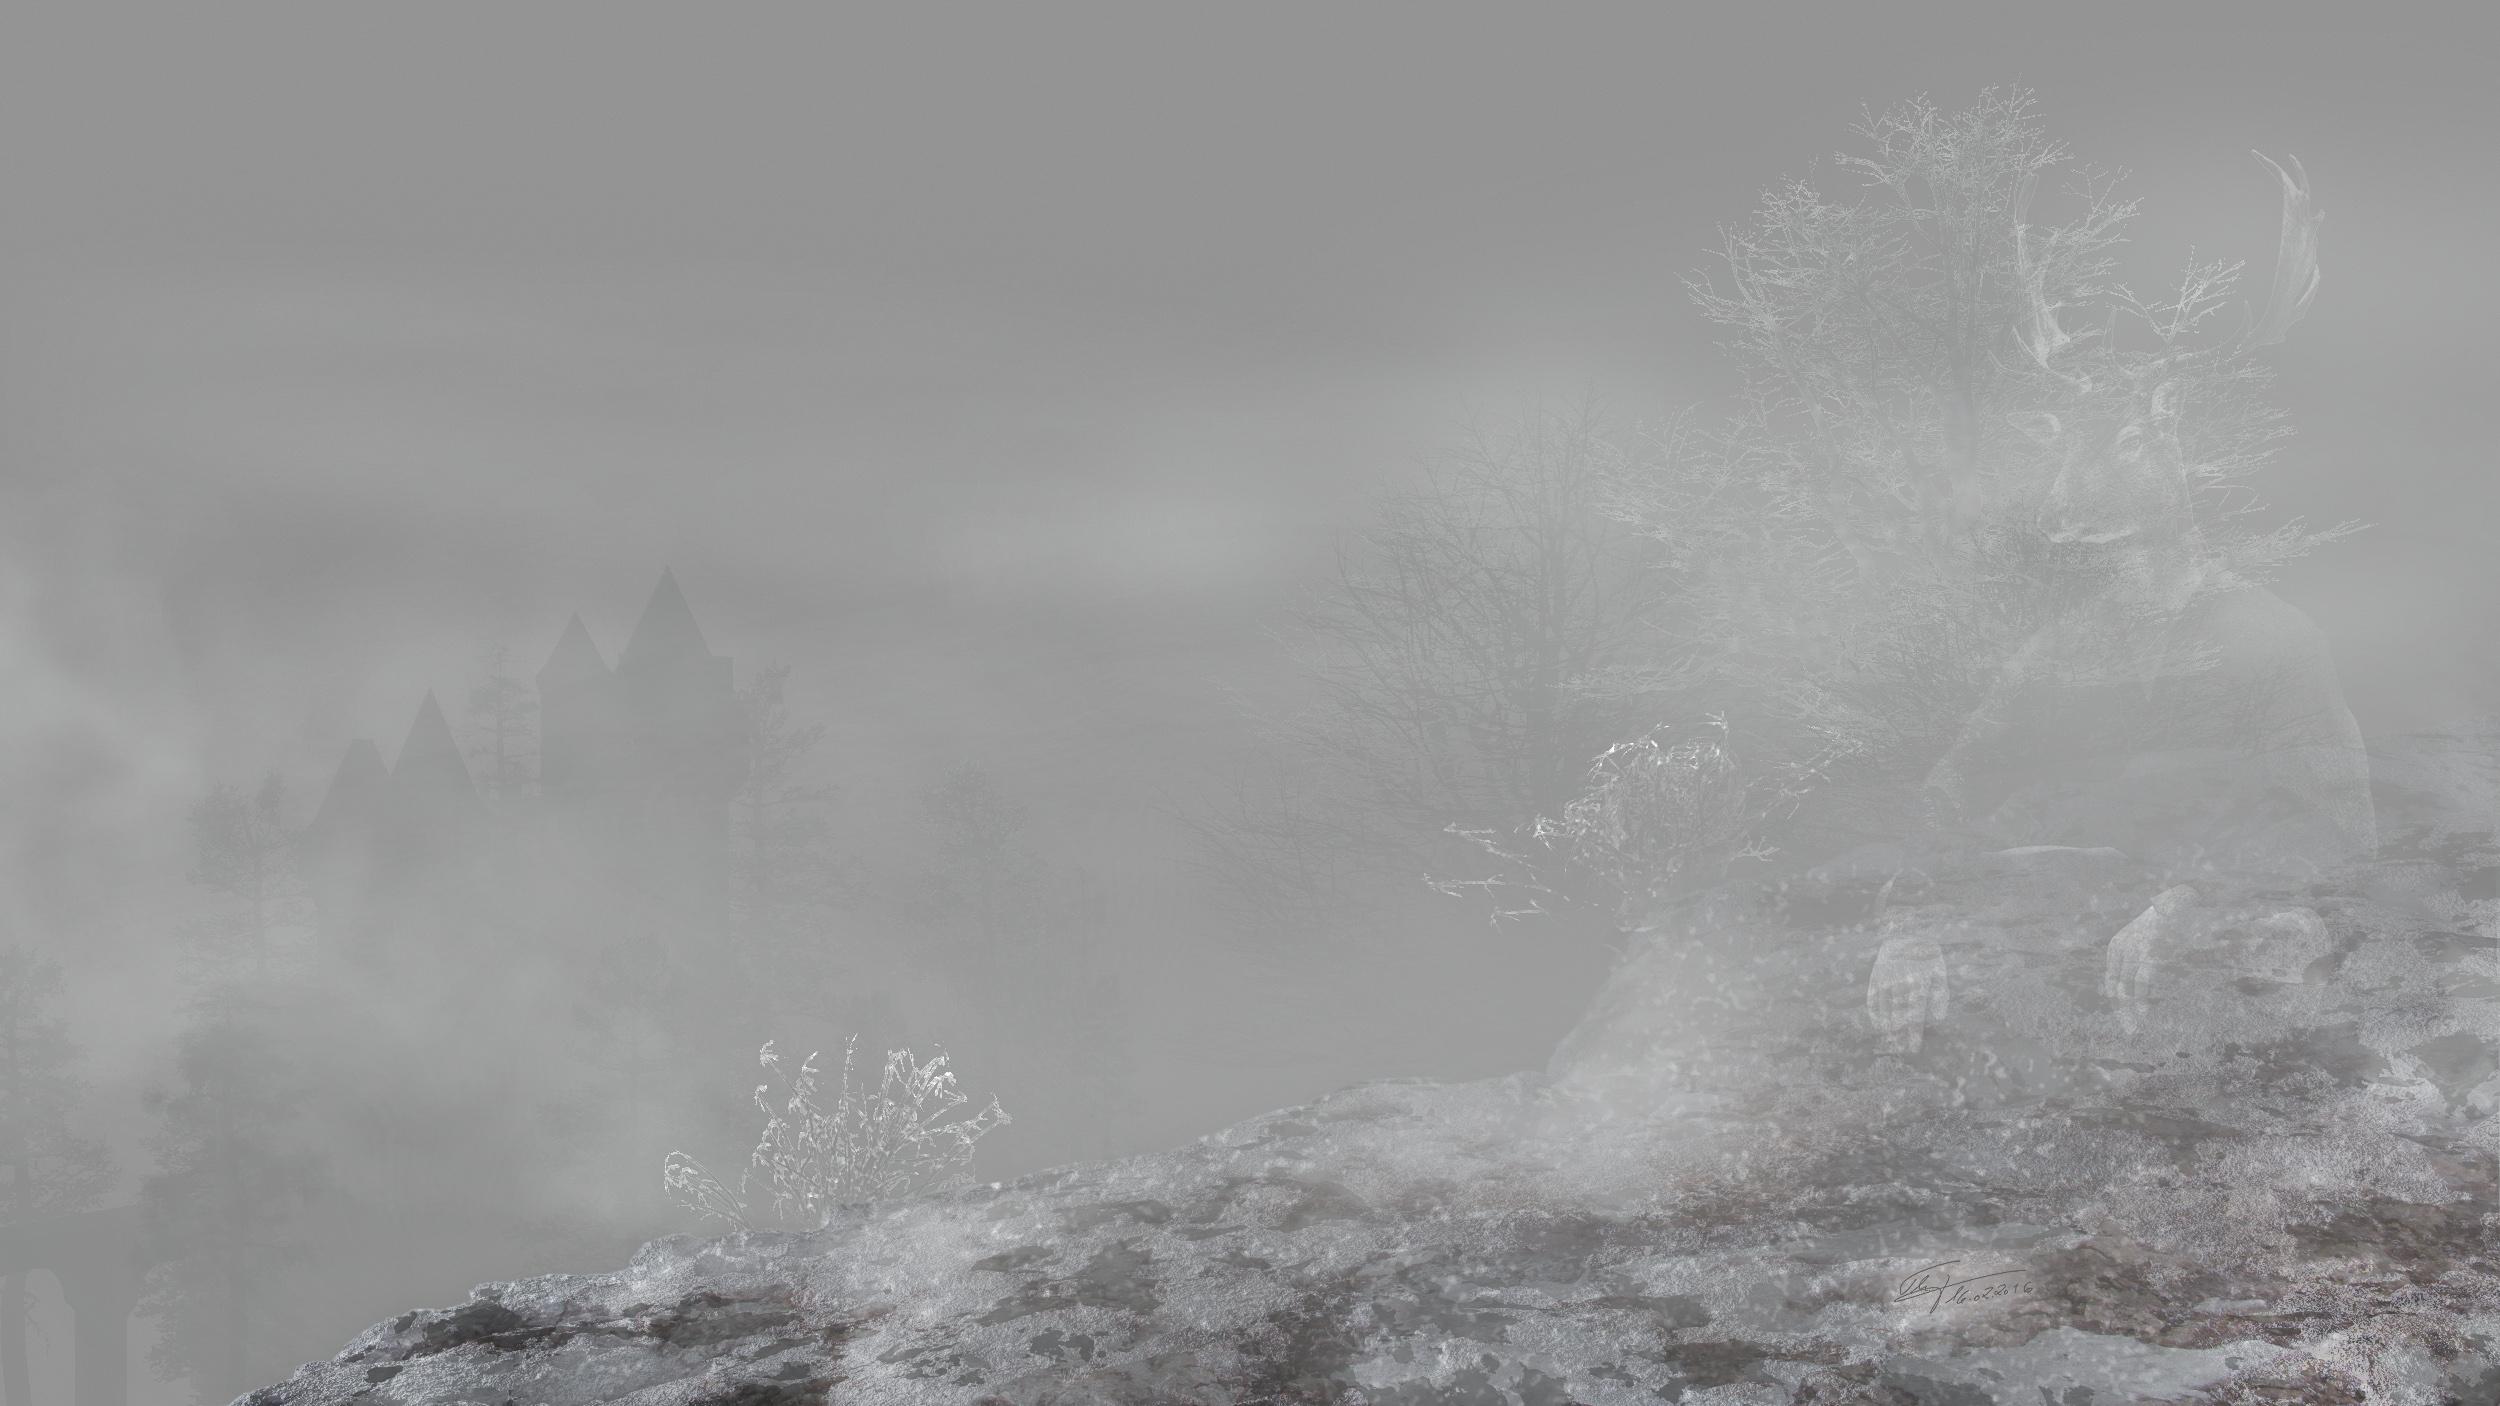 MWD 71; Contest; Cliff in the fog; Winter; Castle; Cold; Ice; Snow